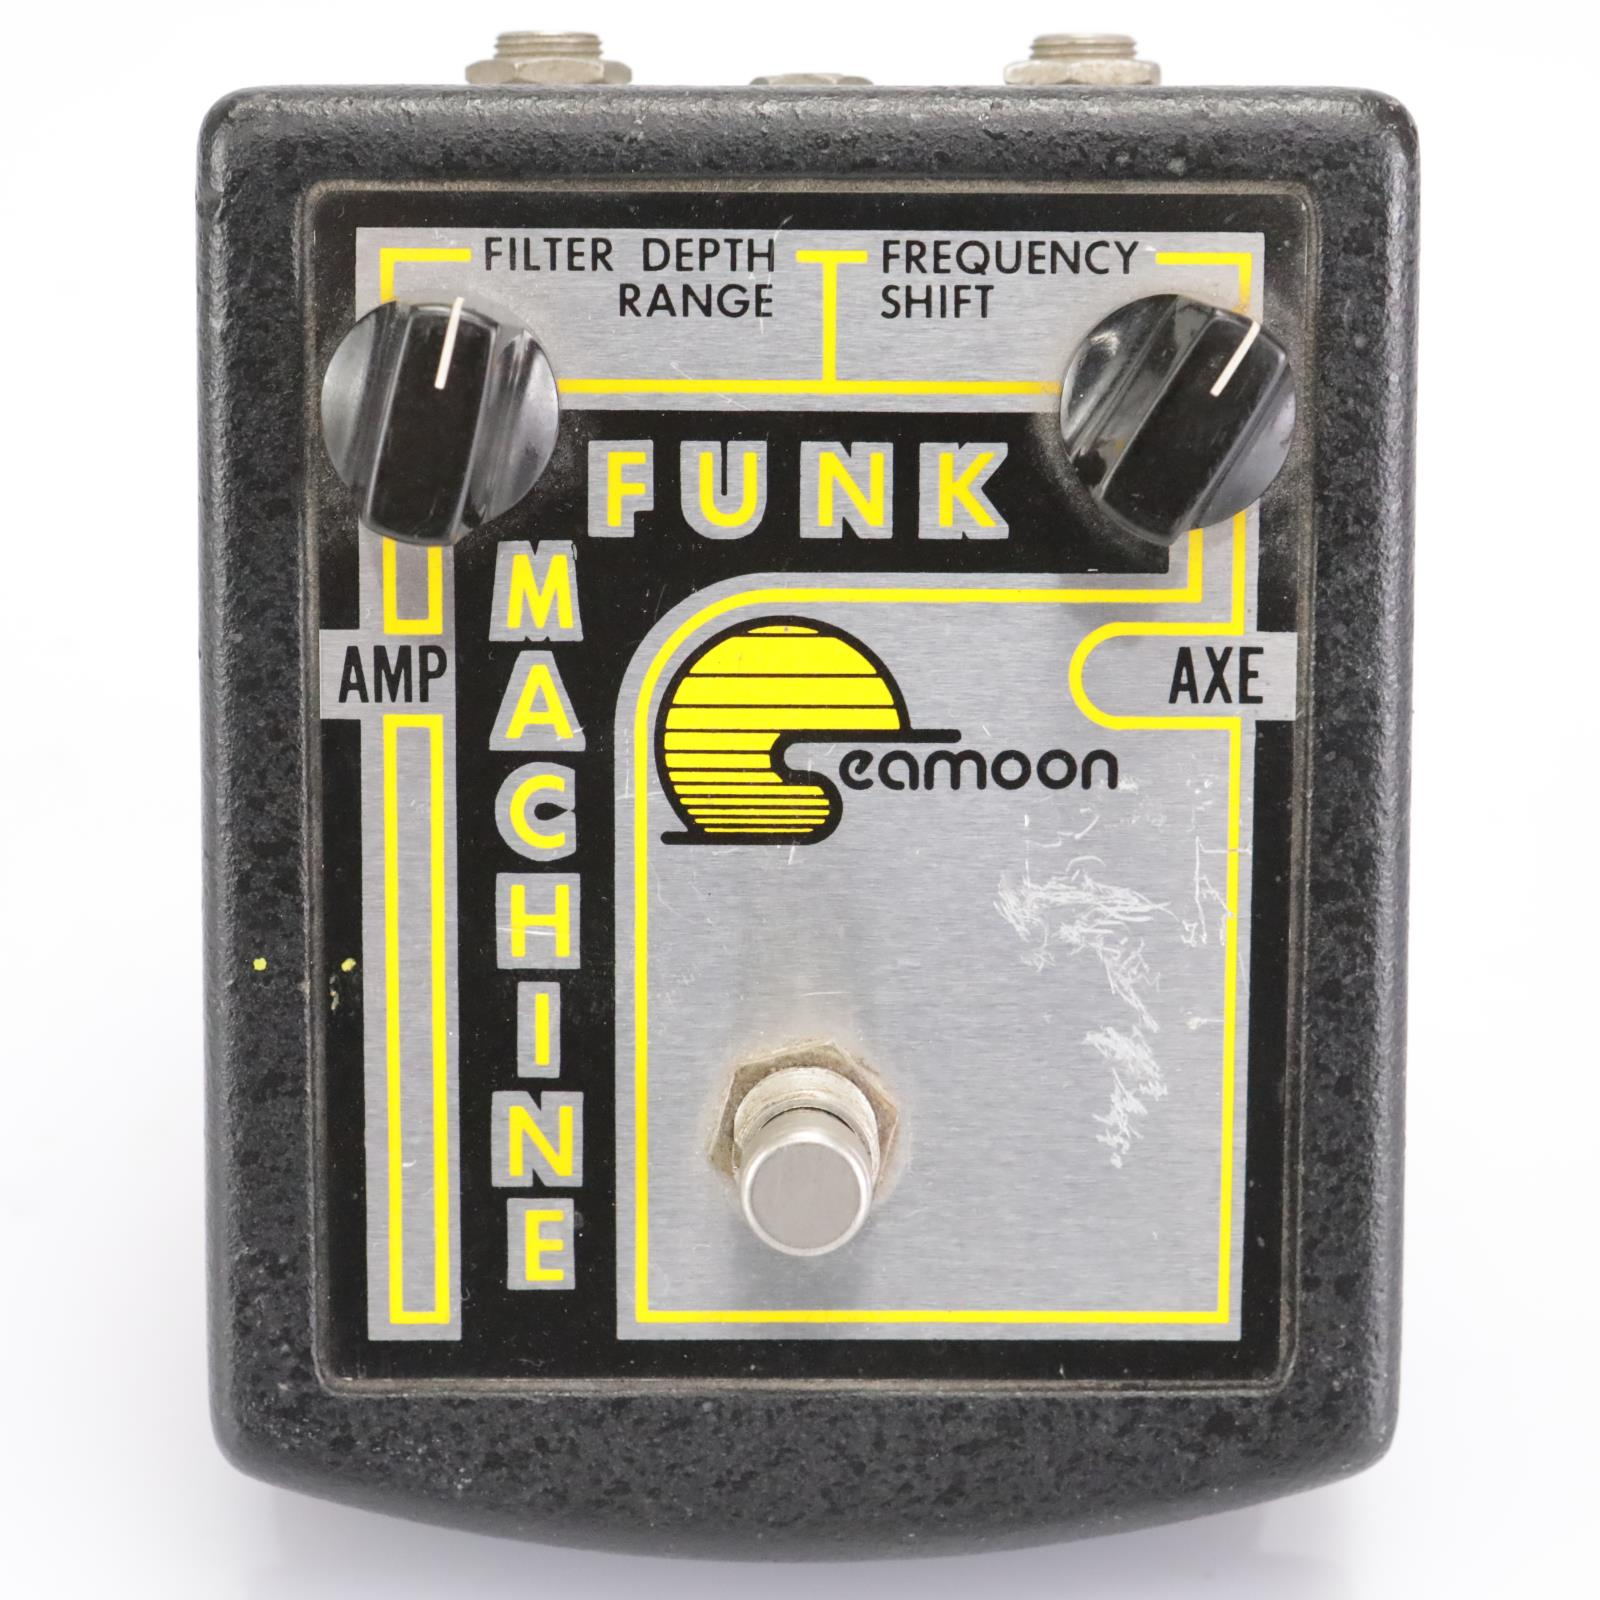 Vintage Seamoon Funk Machine Filter Bass Guitar Effect Pedal Stomp Box #42790